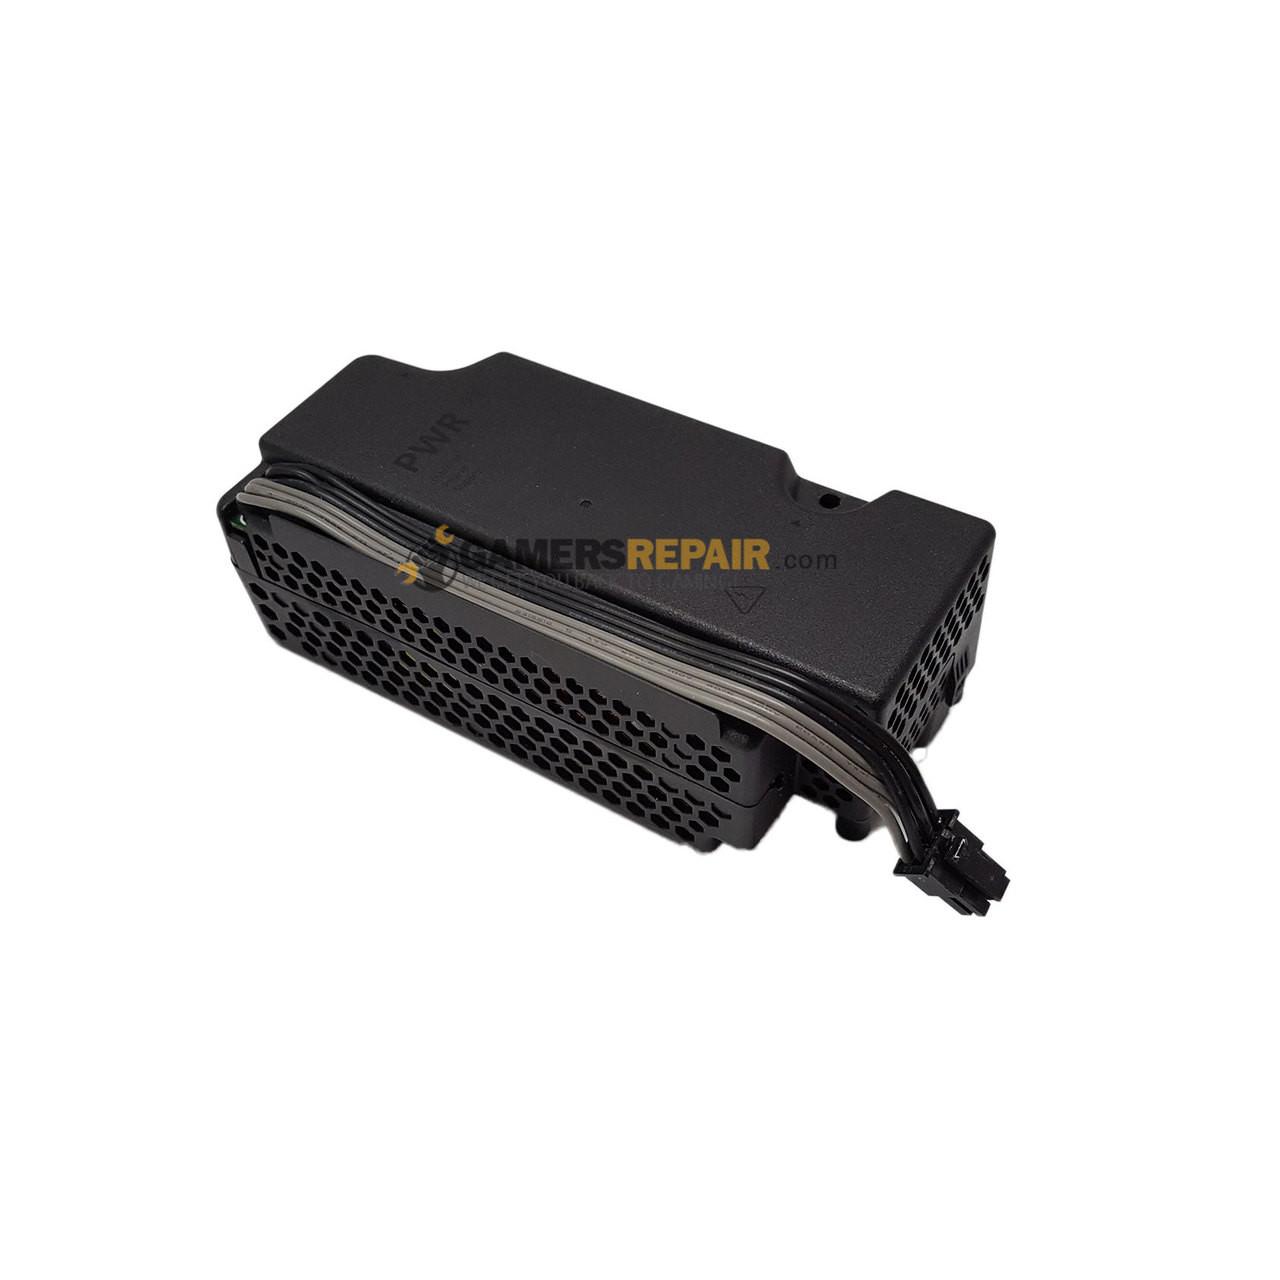 medium resolution of  oem power supply pa 1131 13mx for xbox one s slim